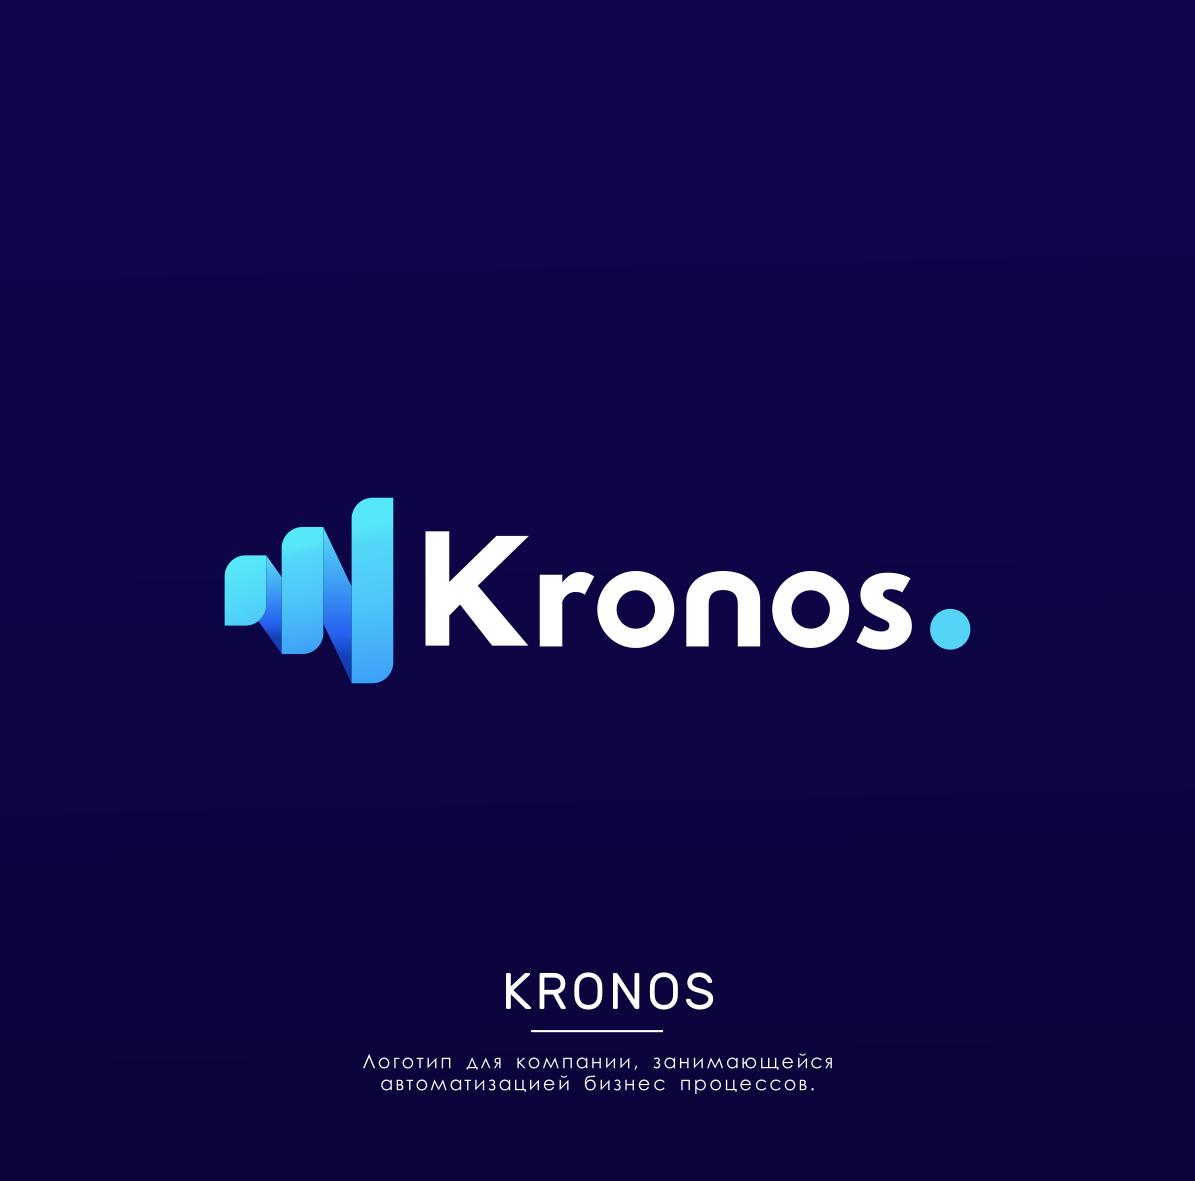 Разработать логотип KRONOS фото f_2645fb218a1214b4.png